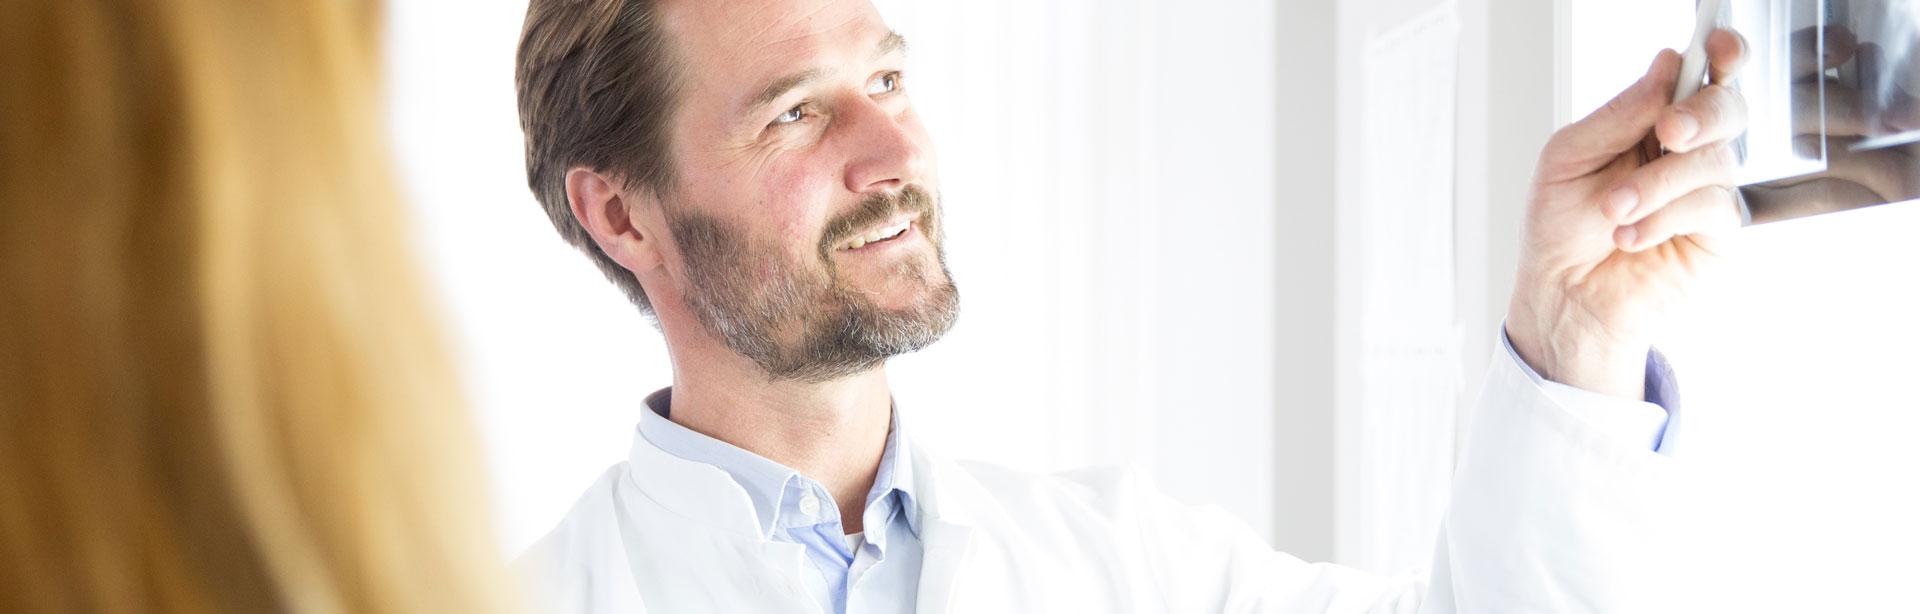 Dr. Johannes Mayrhofer - Stosswellen Therapie Linz, Institut Medaktiv